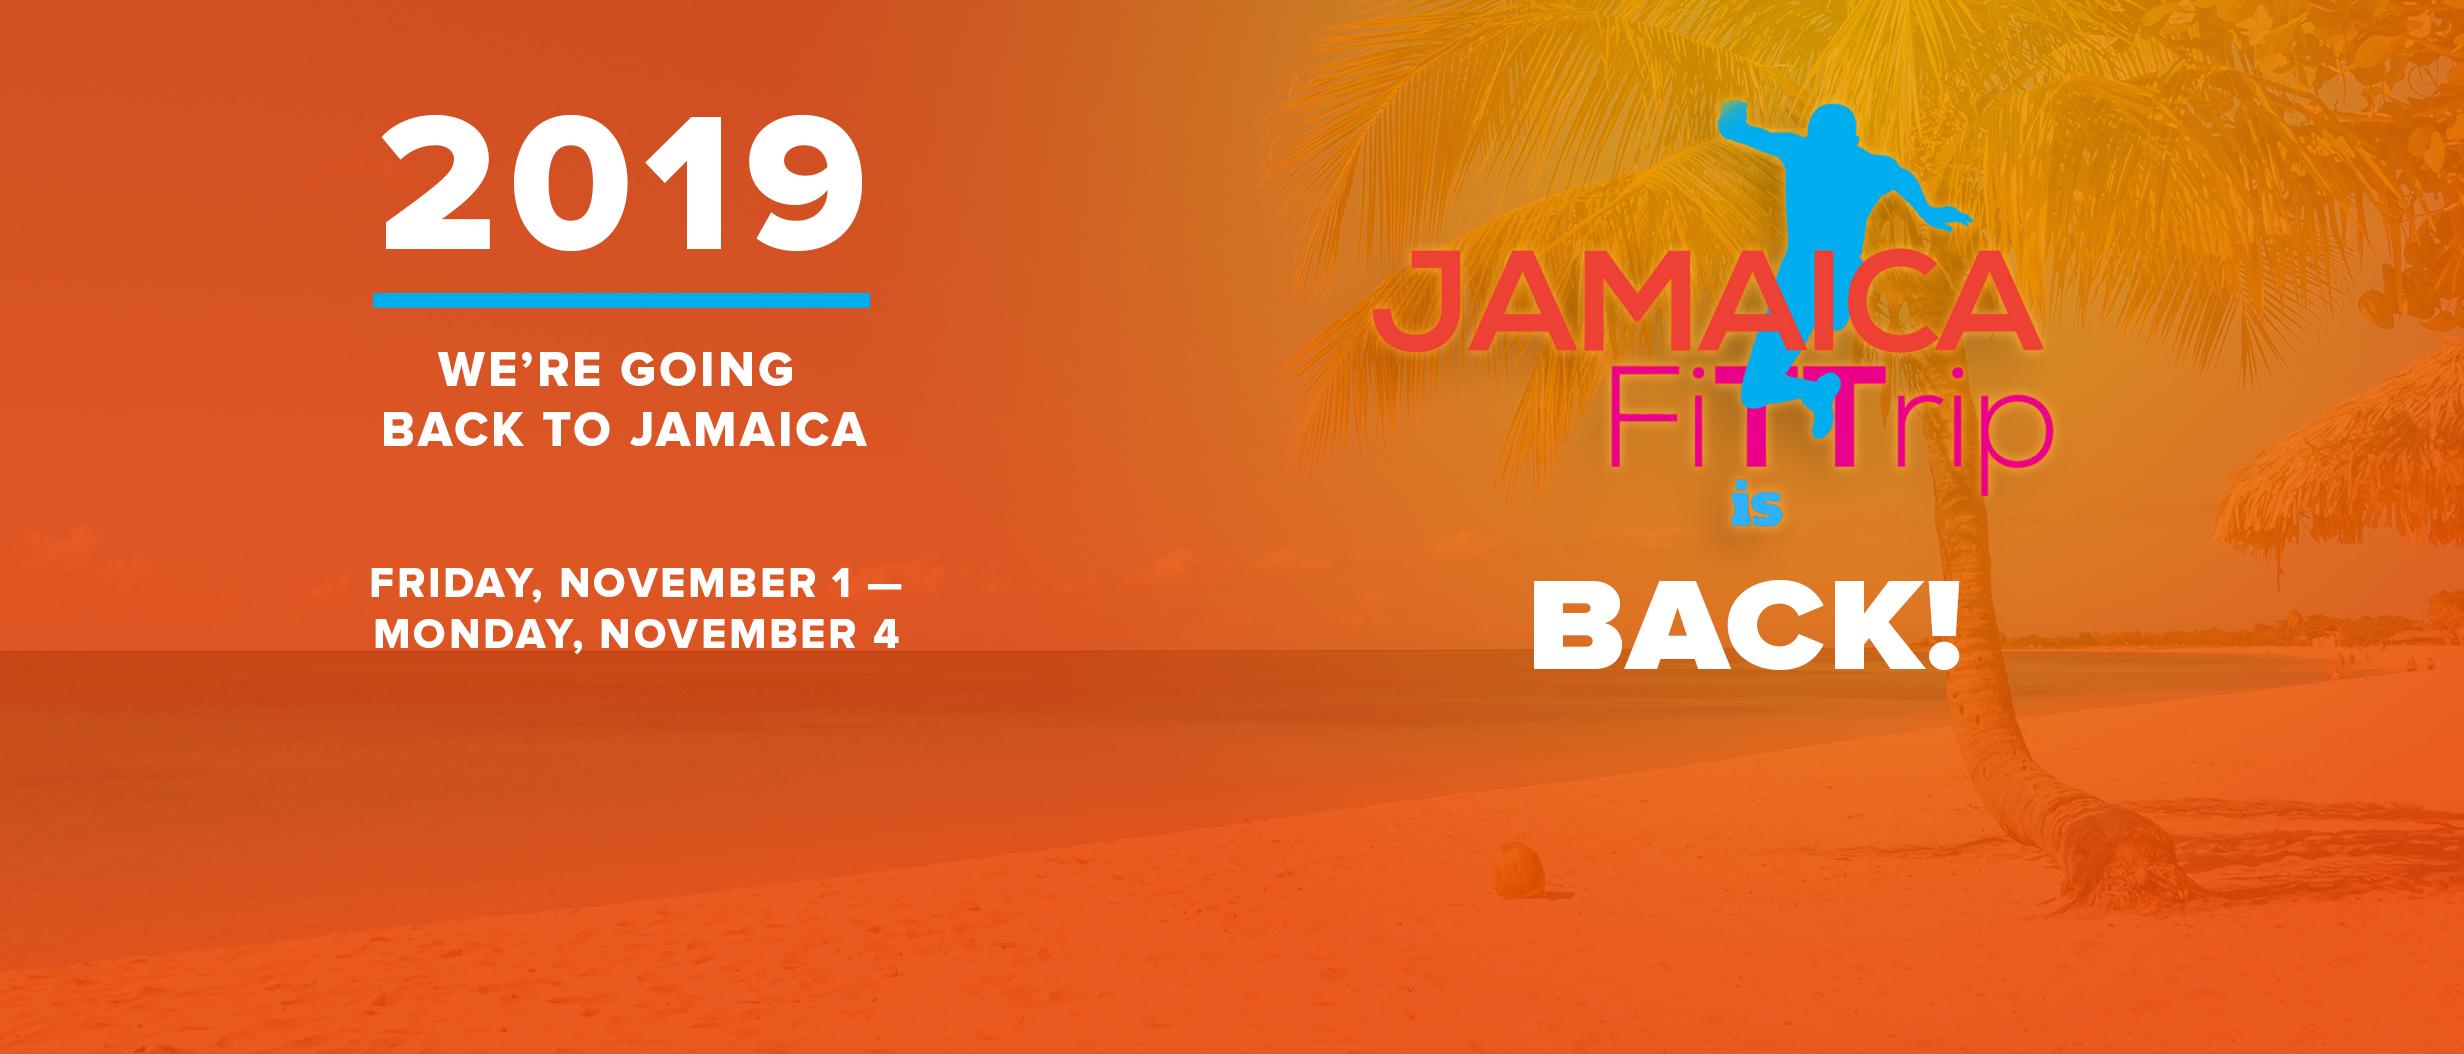 Jamaica Fit Trip 2019